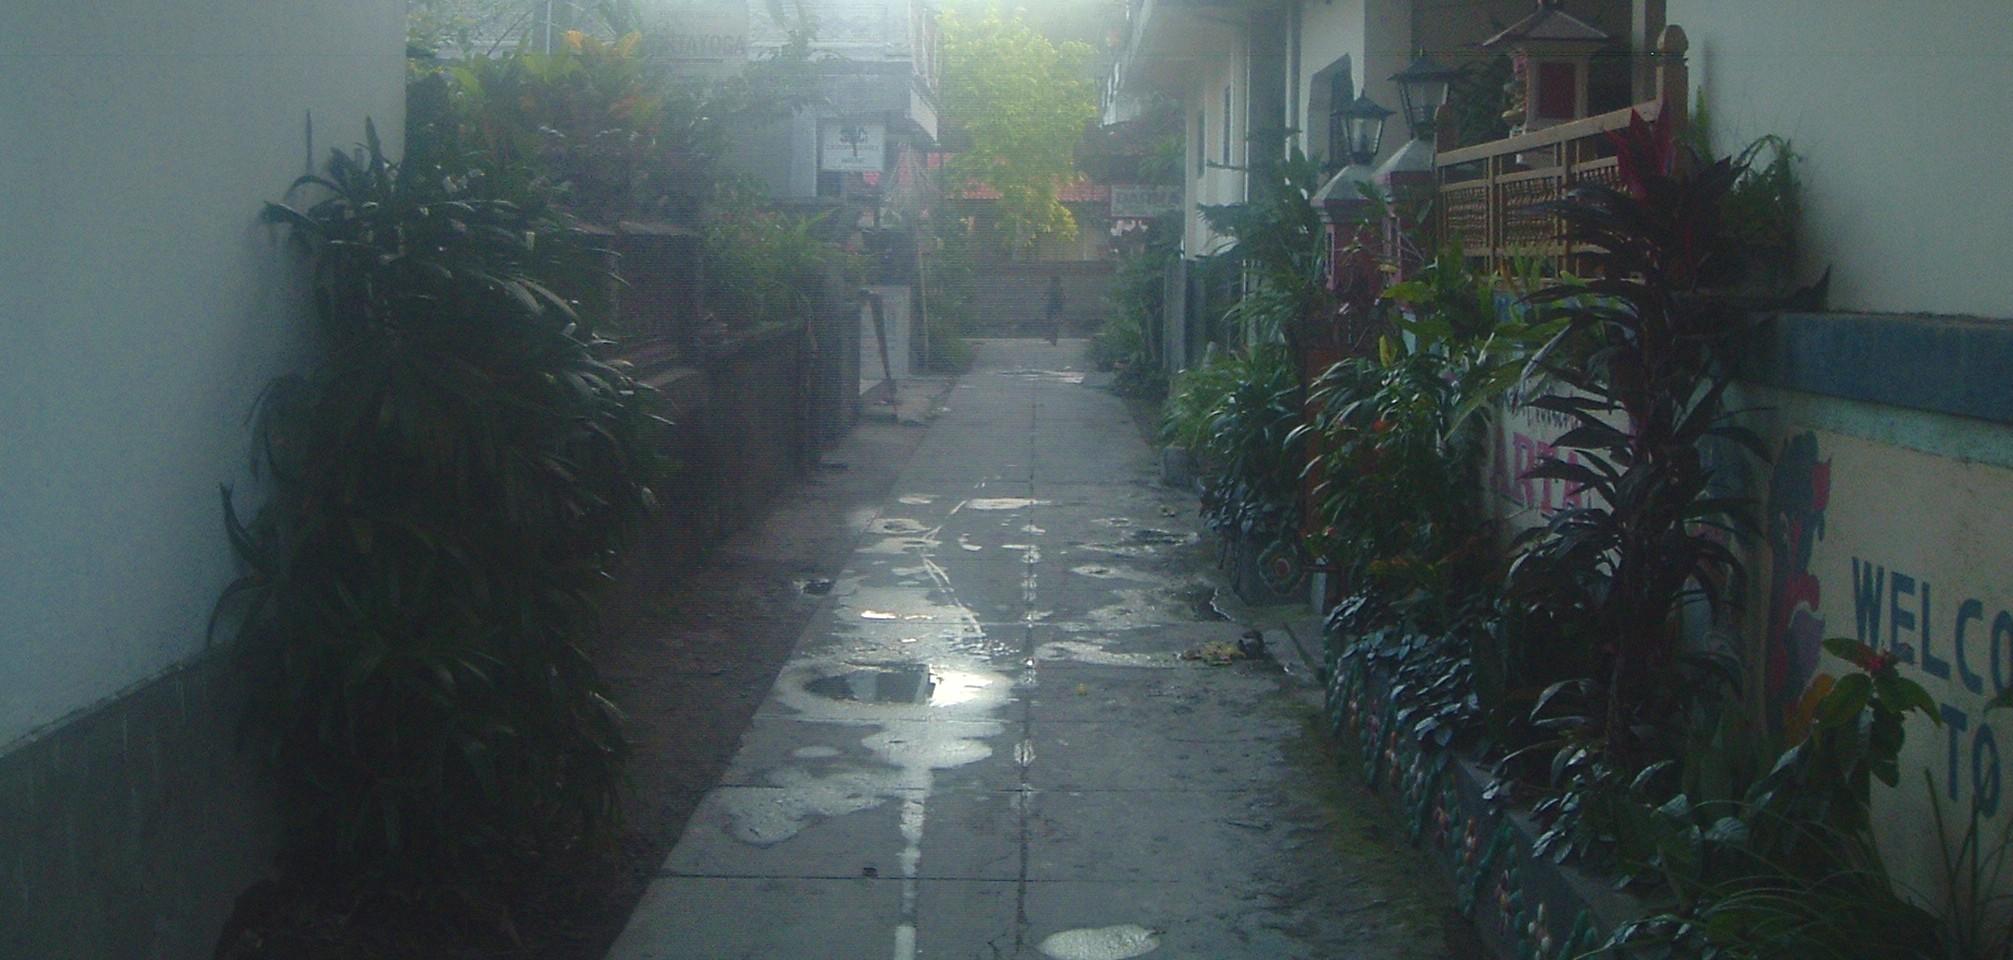 padangbai alley.JPG